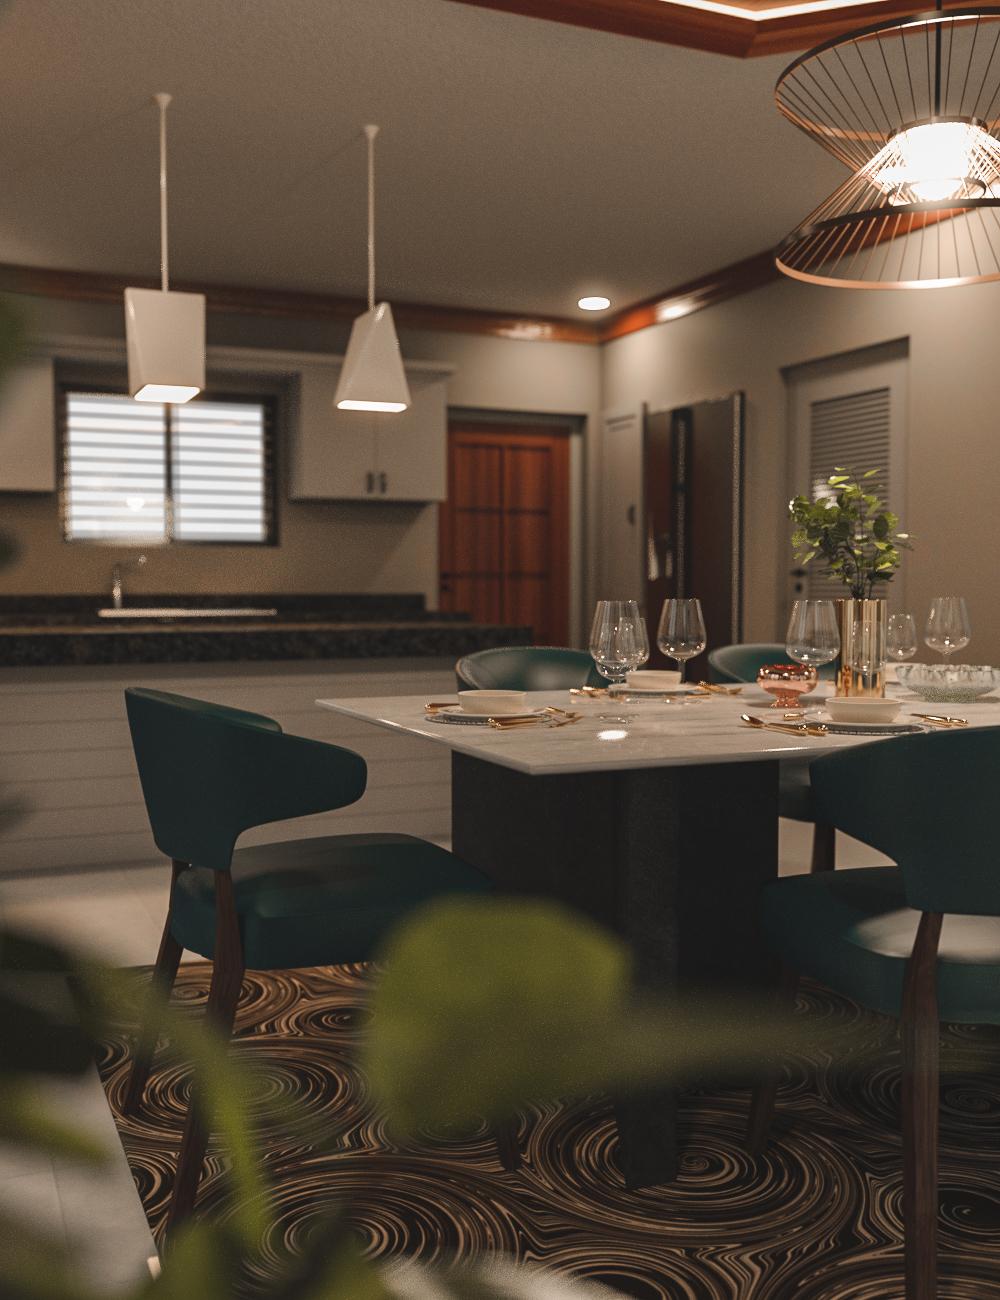 Avil Kitchen Dining Room by: Tesla3dCorp, 3D Models by Daz 3D